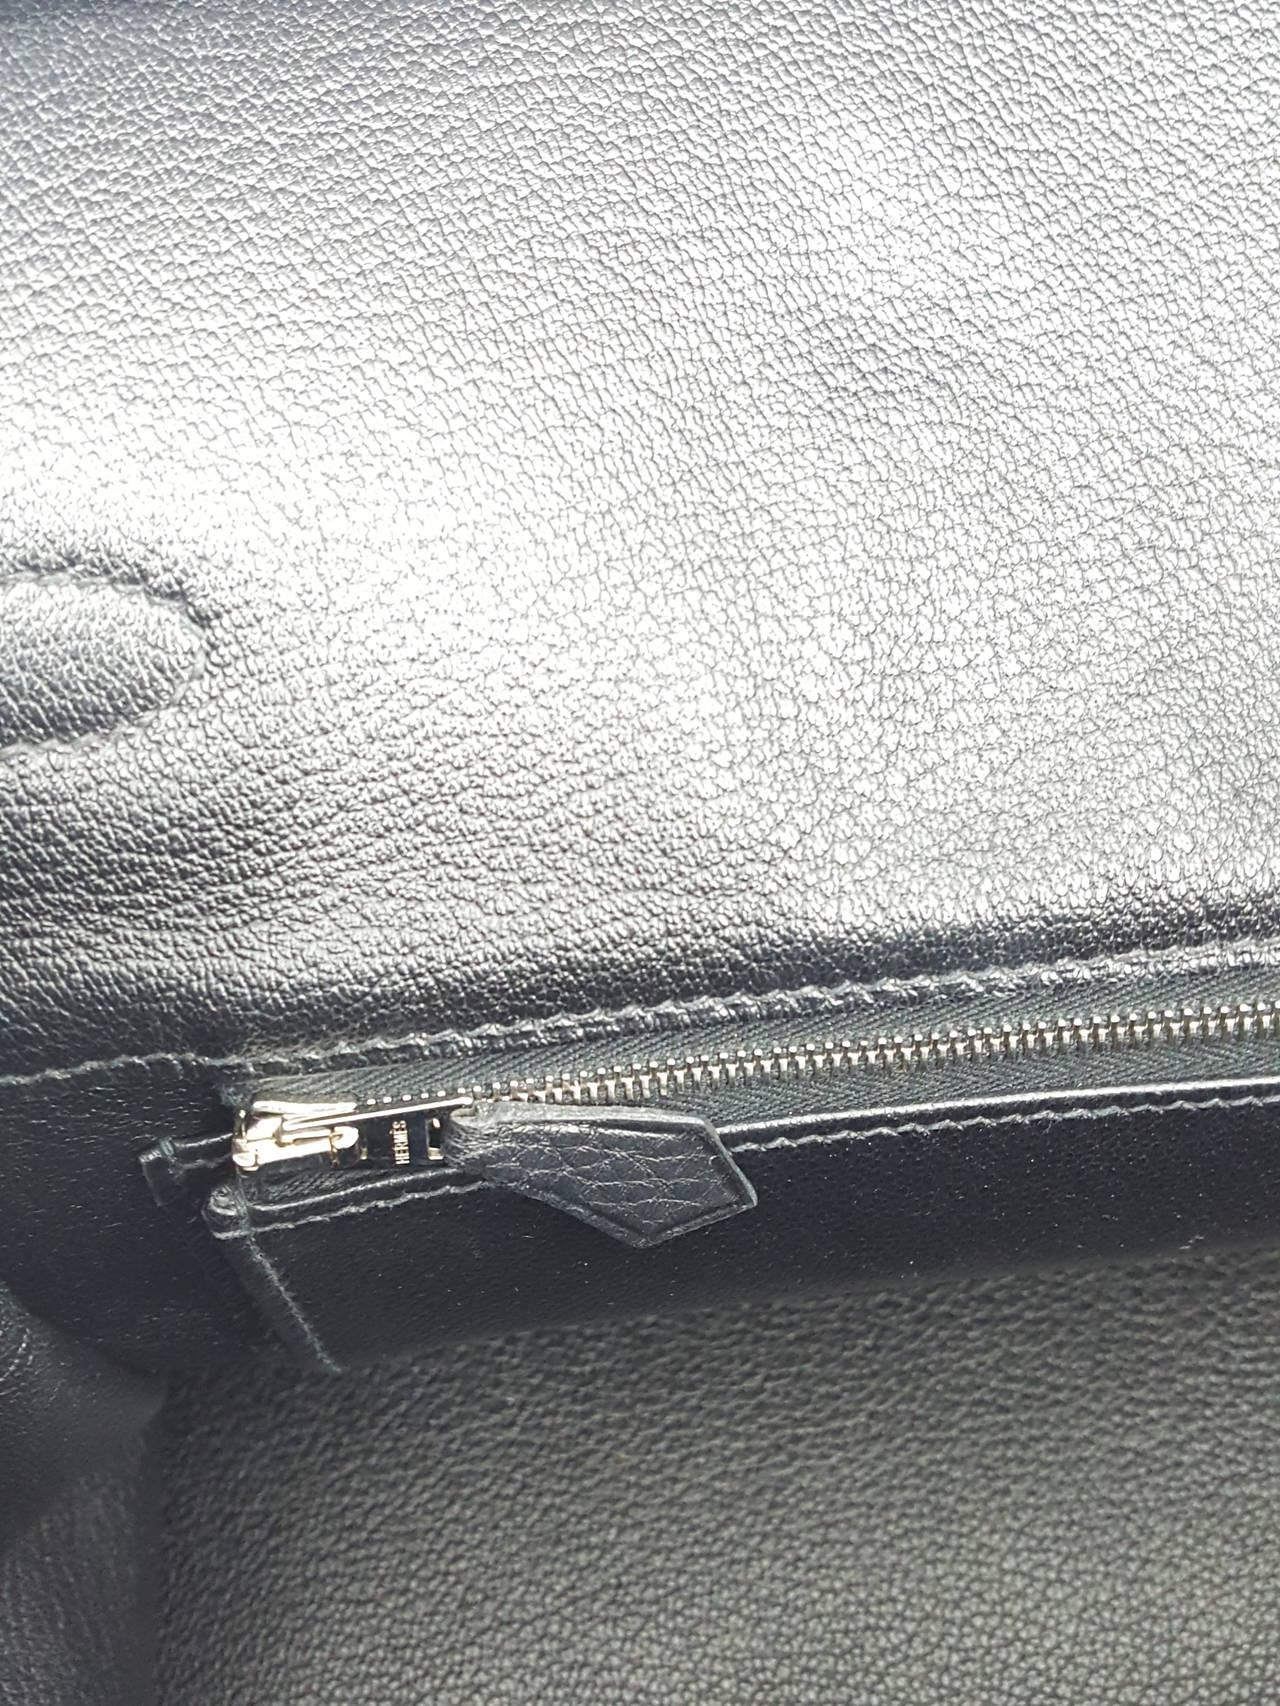 HERMES Birkin 35 CM In Black Clemence Leather With Palladium Hardware. 8